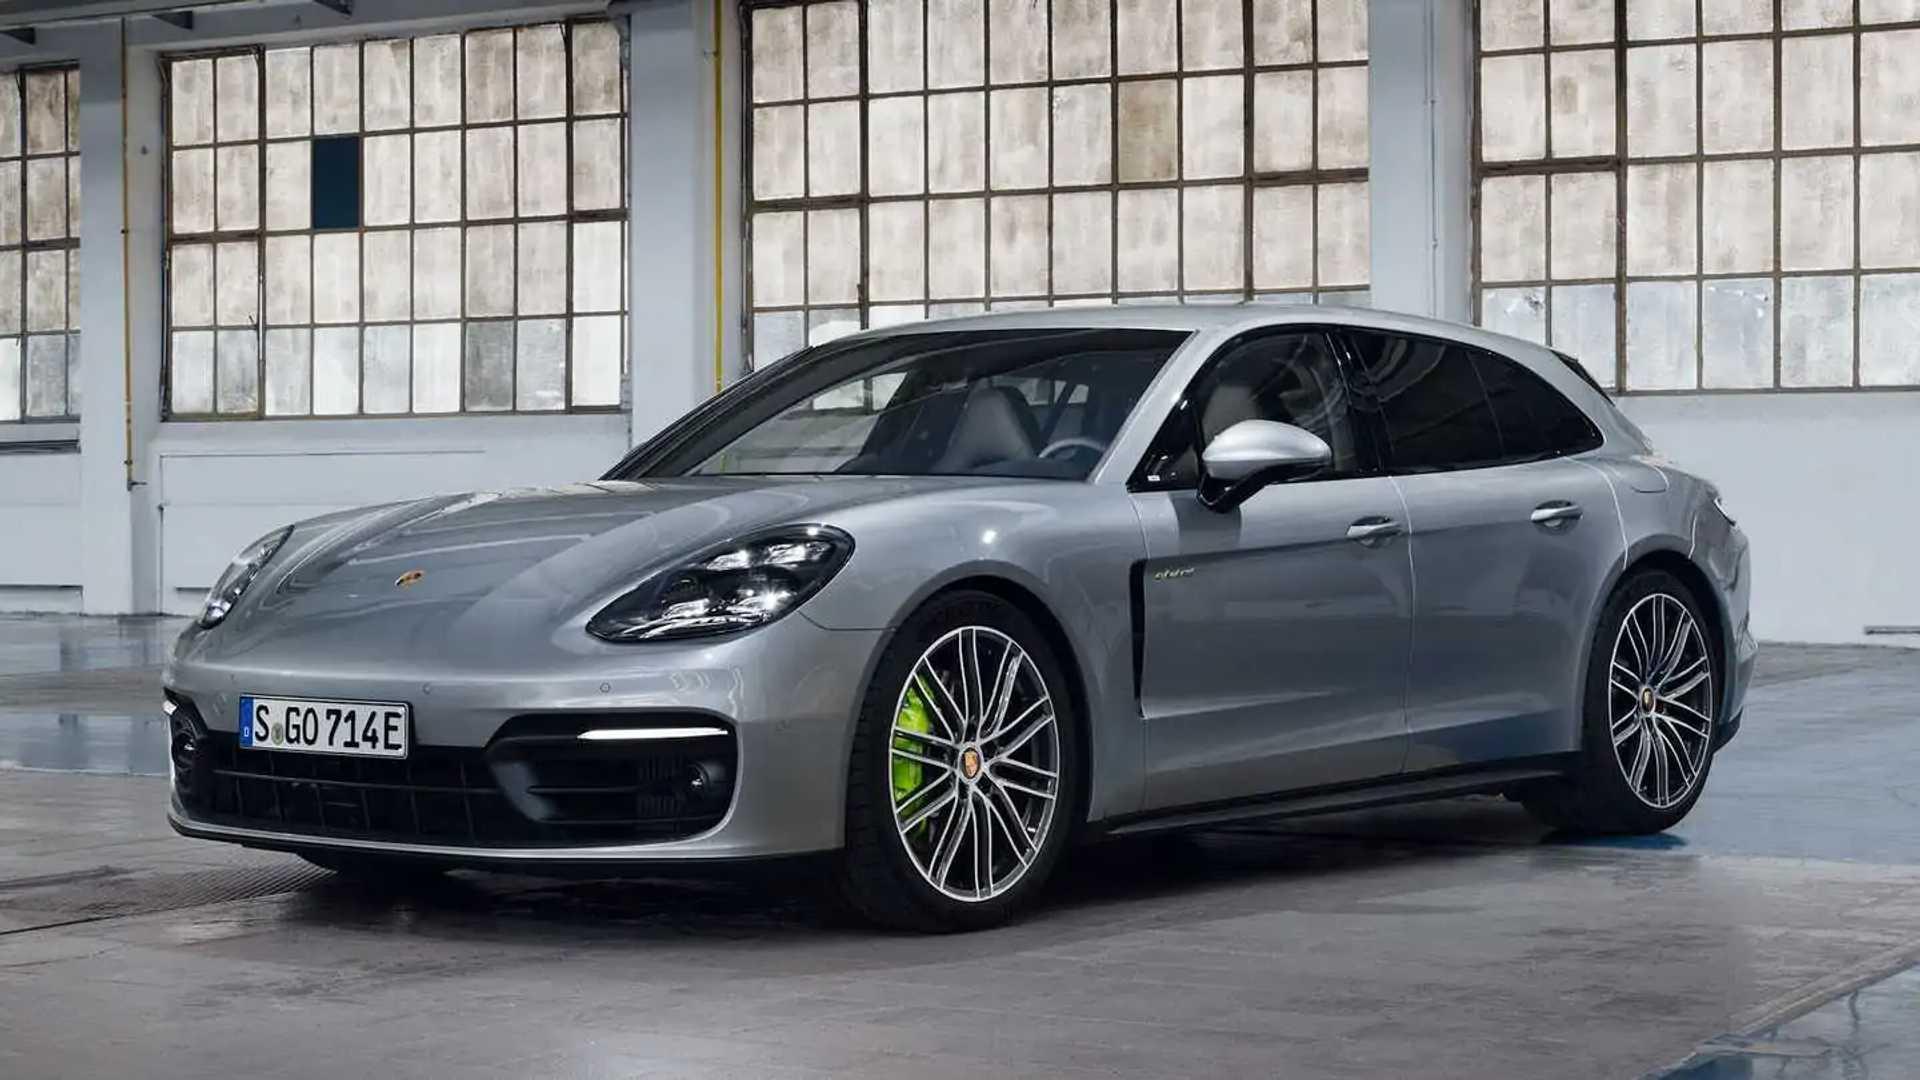 2021 Porsche Panamera 4 E-Hybrid Front 3/4